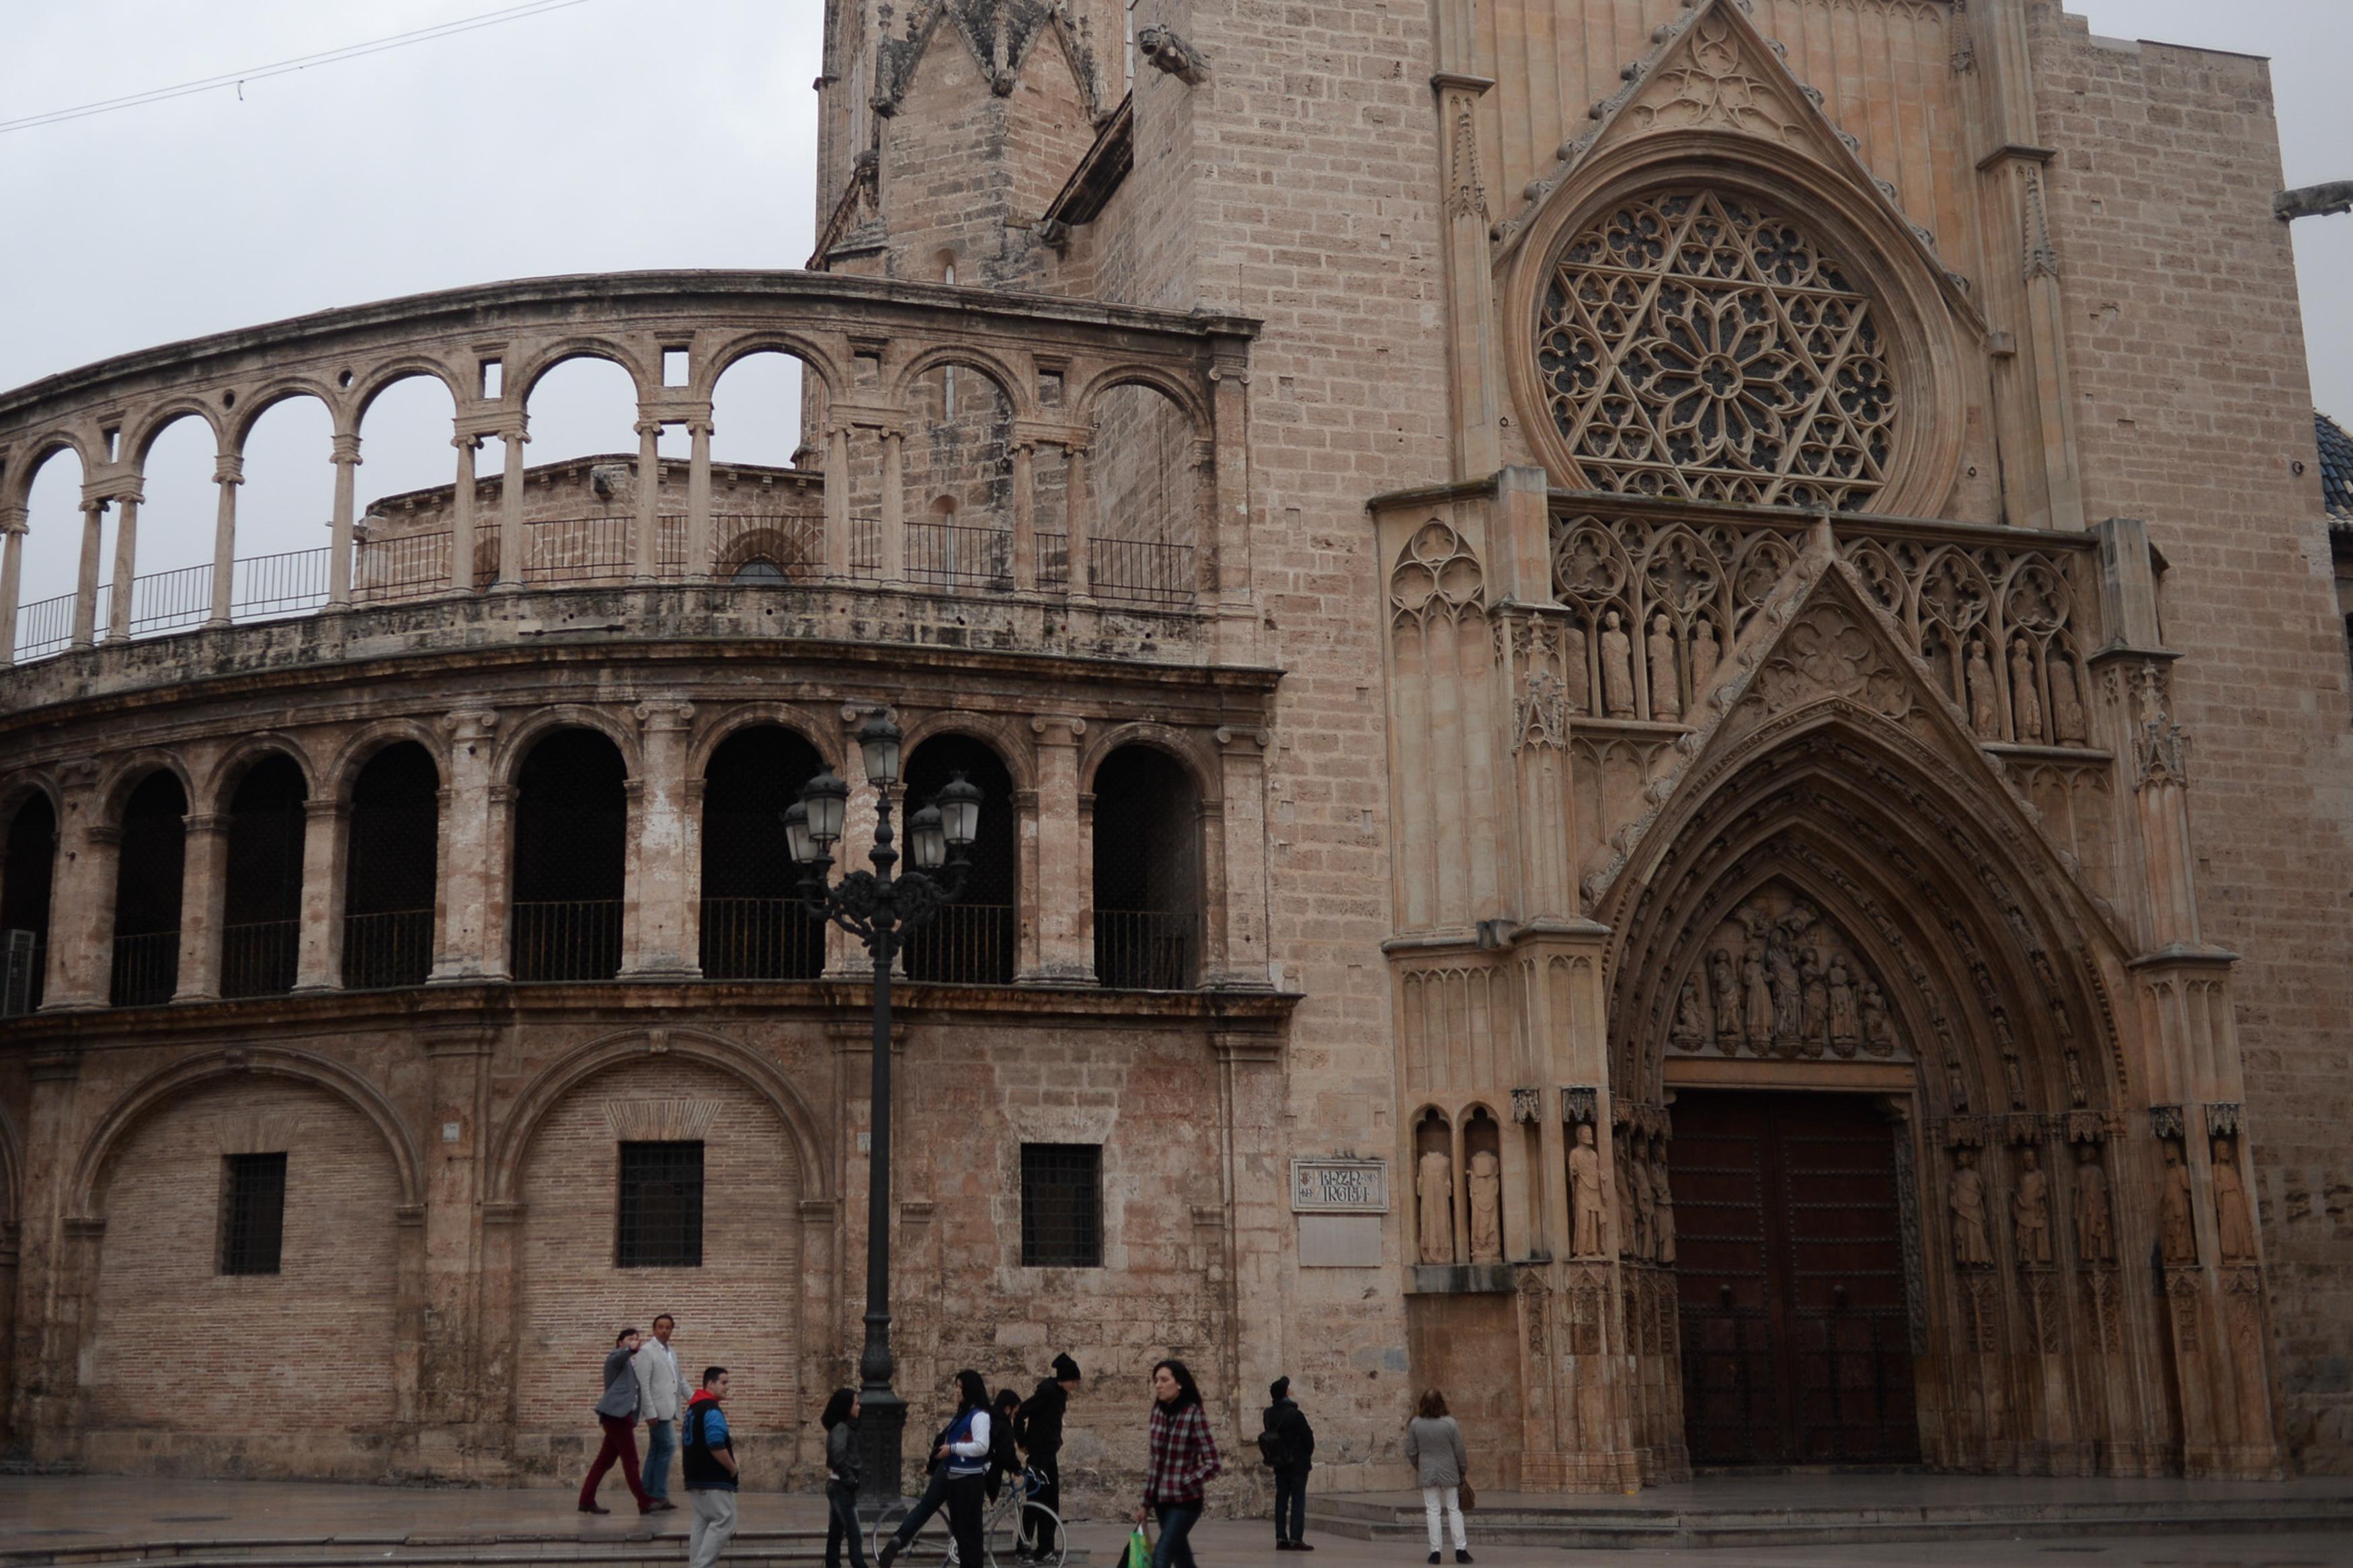 Valencia Cathedral seen from Plaza de la Virgen (Virgin). Valencia, Spain, Southwestern Europe. September 28, 2014.jpg